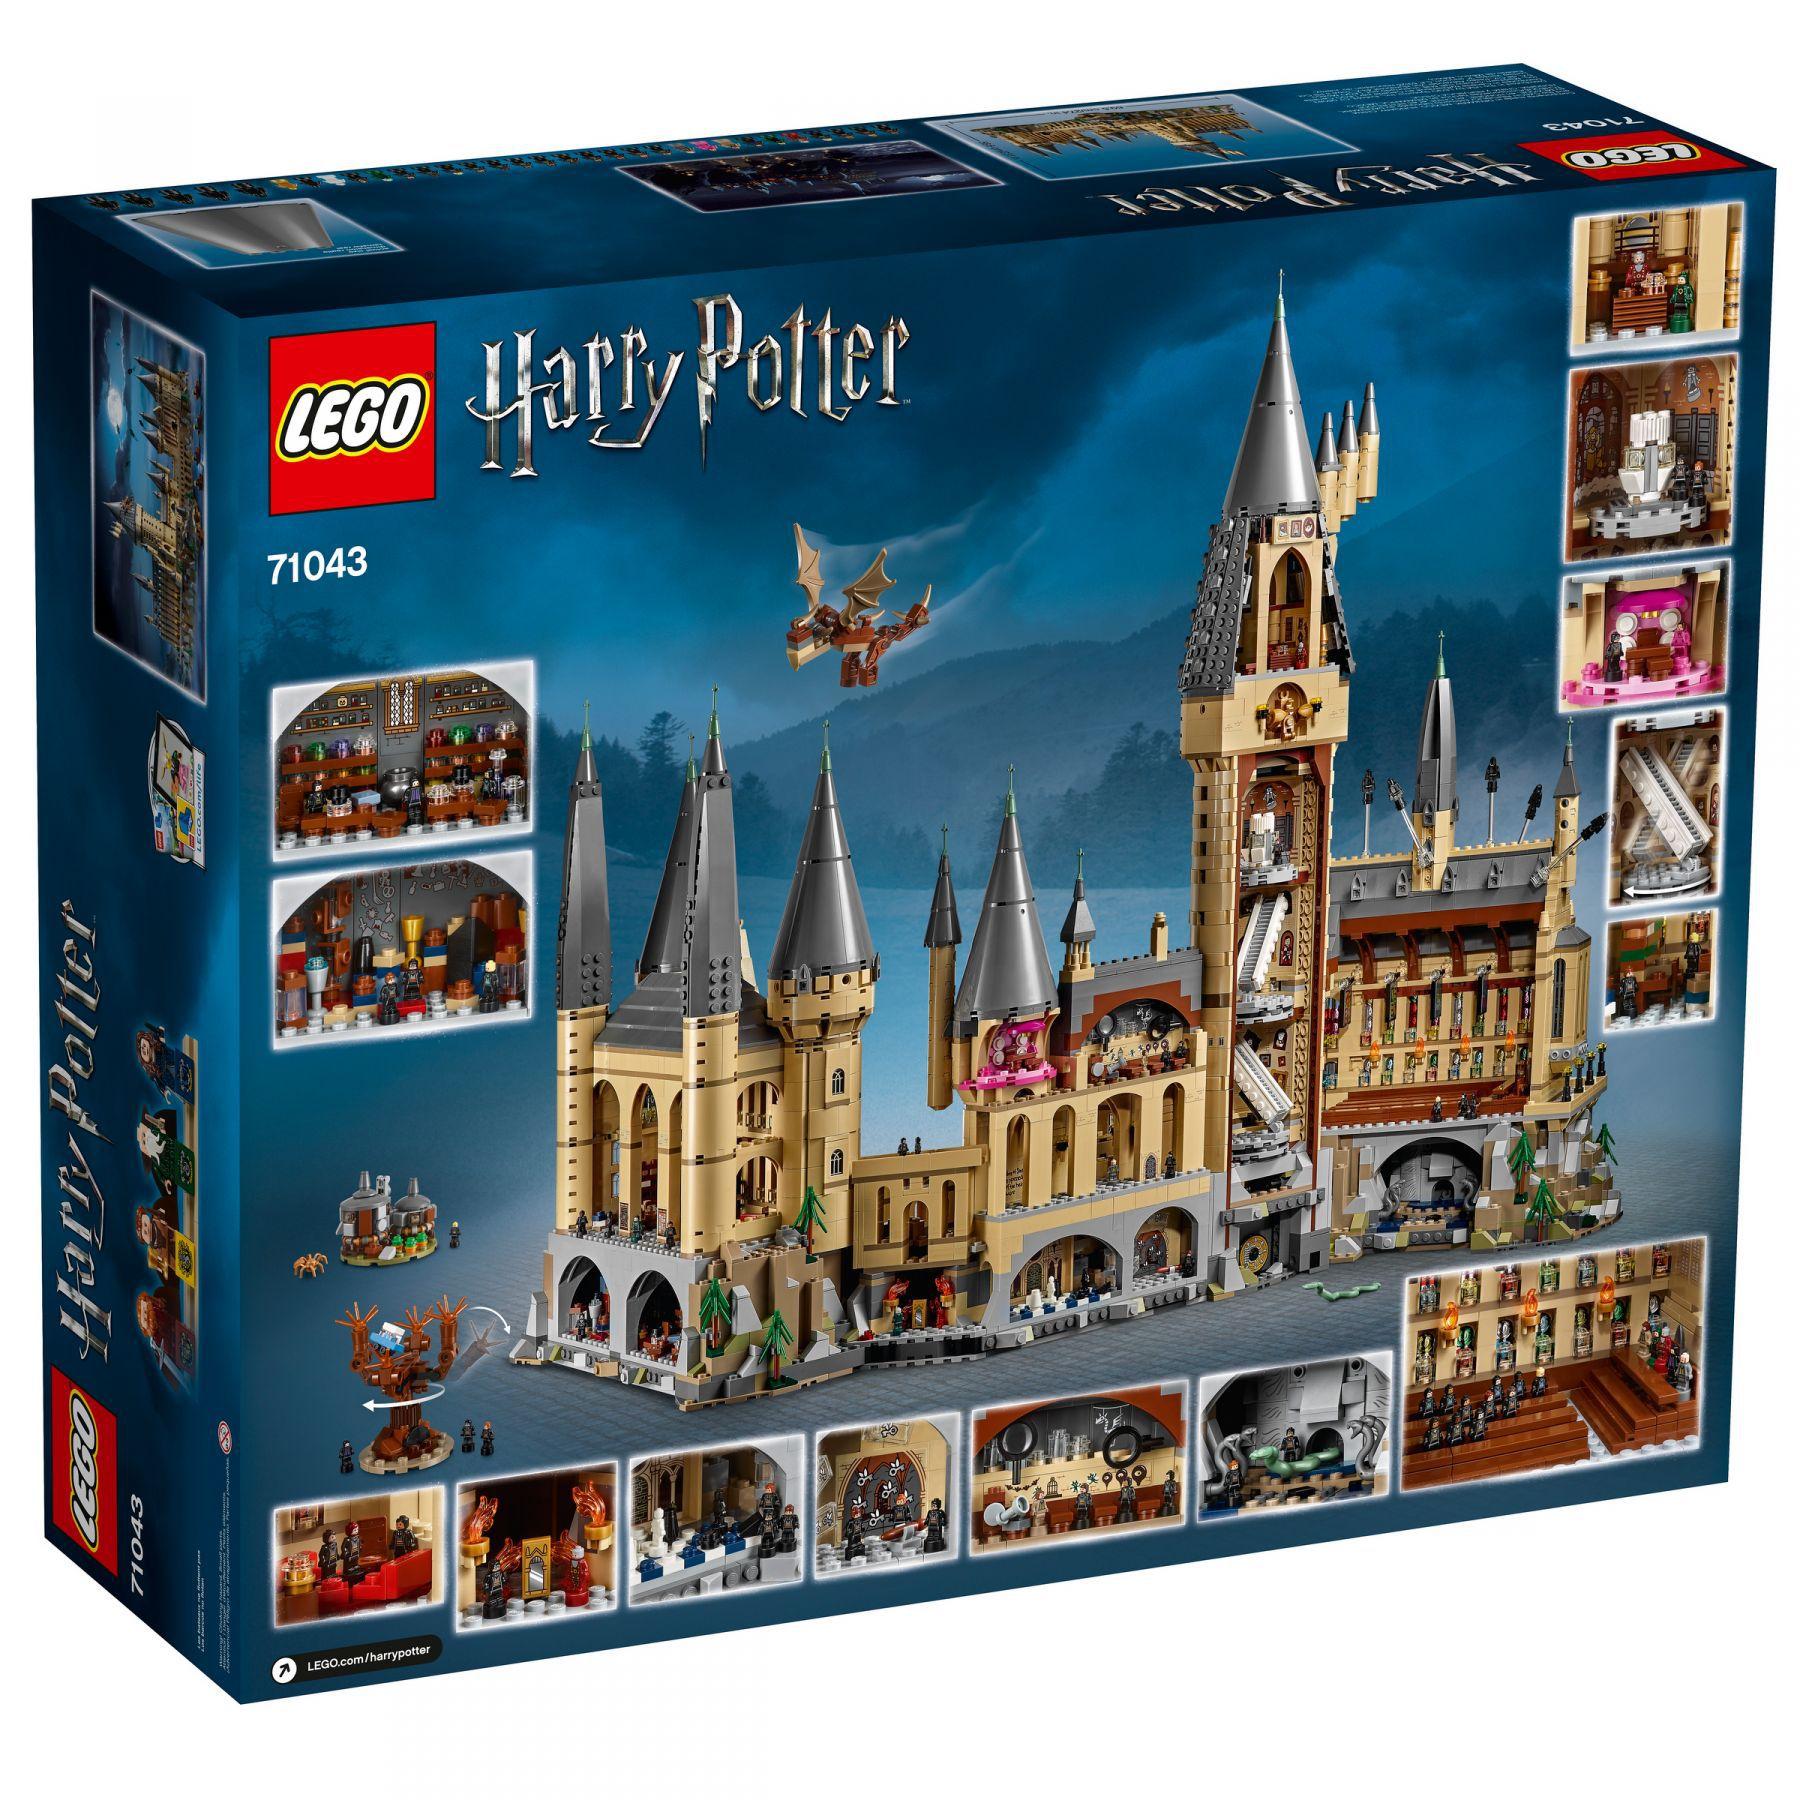 LEGO_71043_Hogwarts-Castle-2.jpg